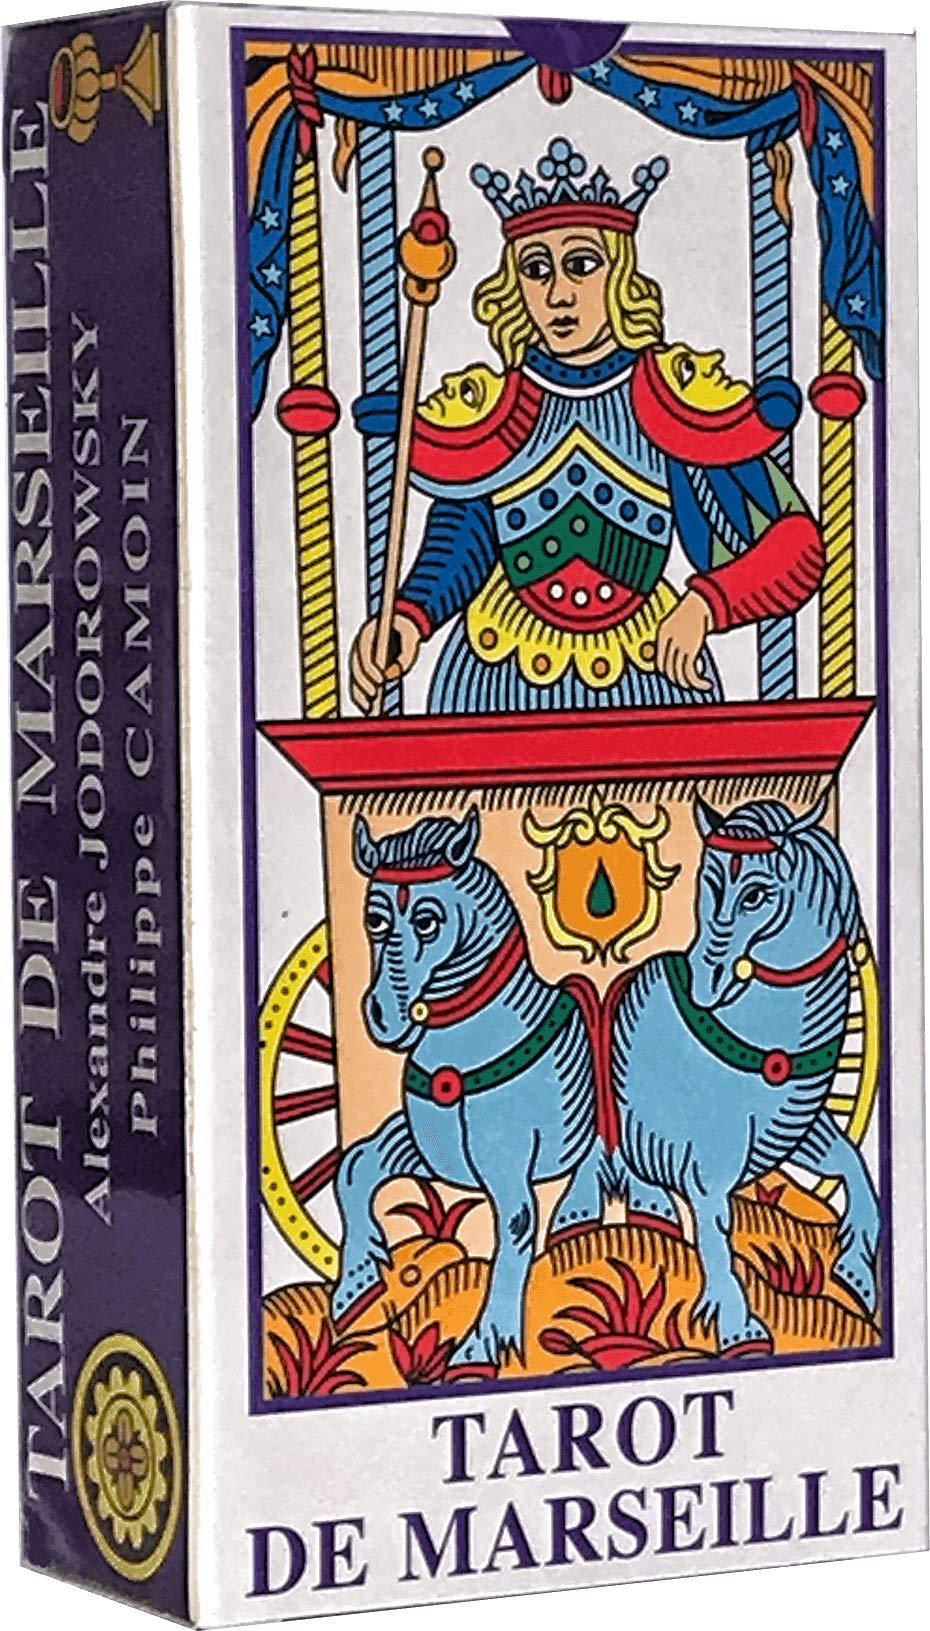 CAMOIN - Tarot de Marseille Camoin-Jodorowsky